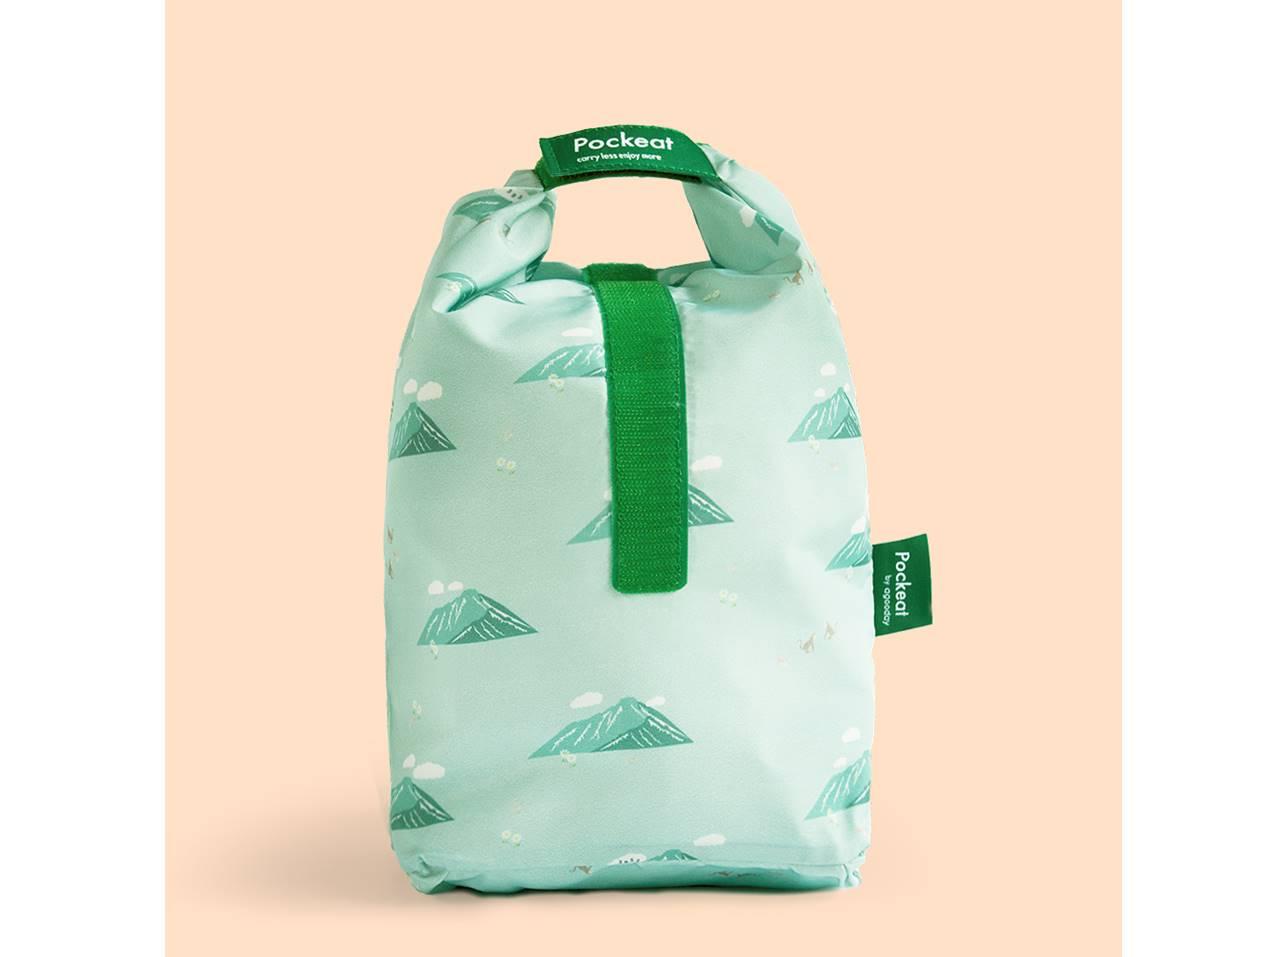 Pockeat 食物袋(大)玉山